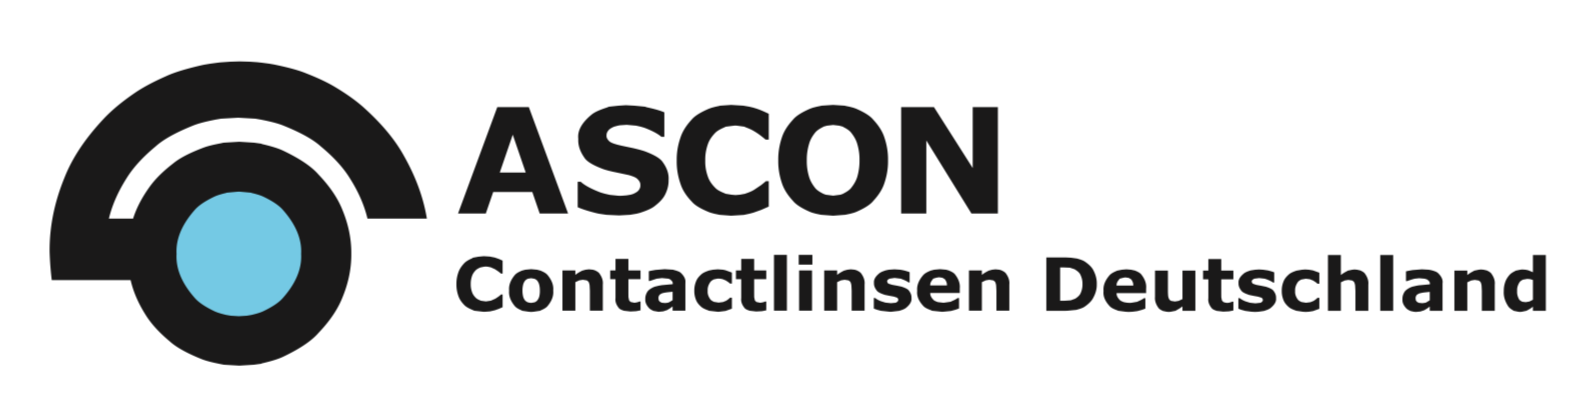 ASCON contactlinsen Deutschland